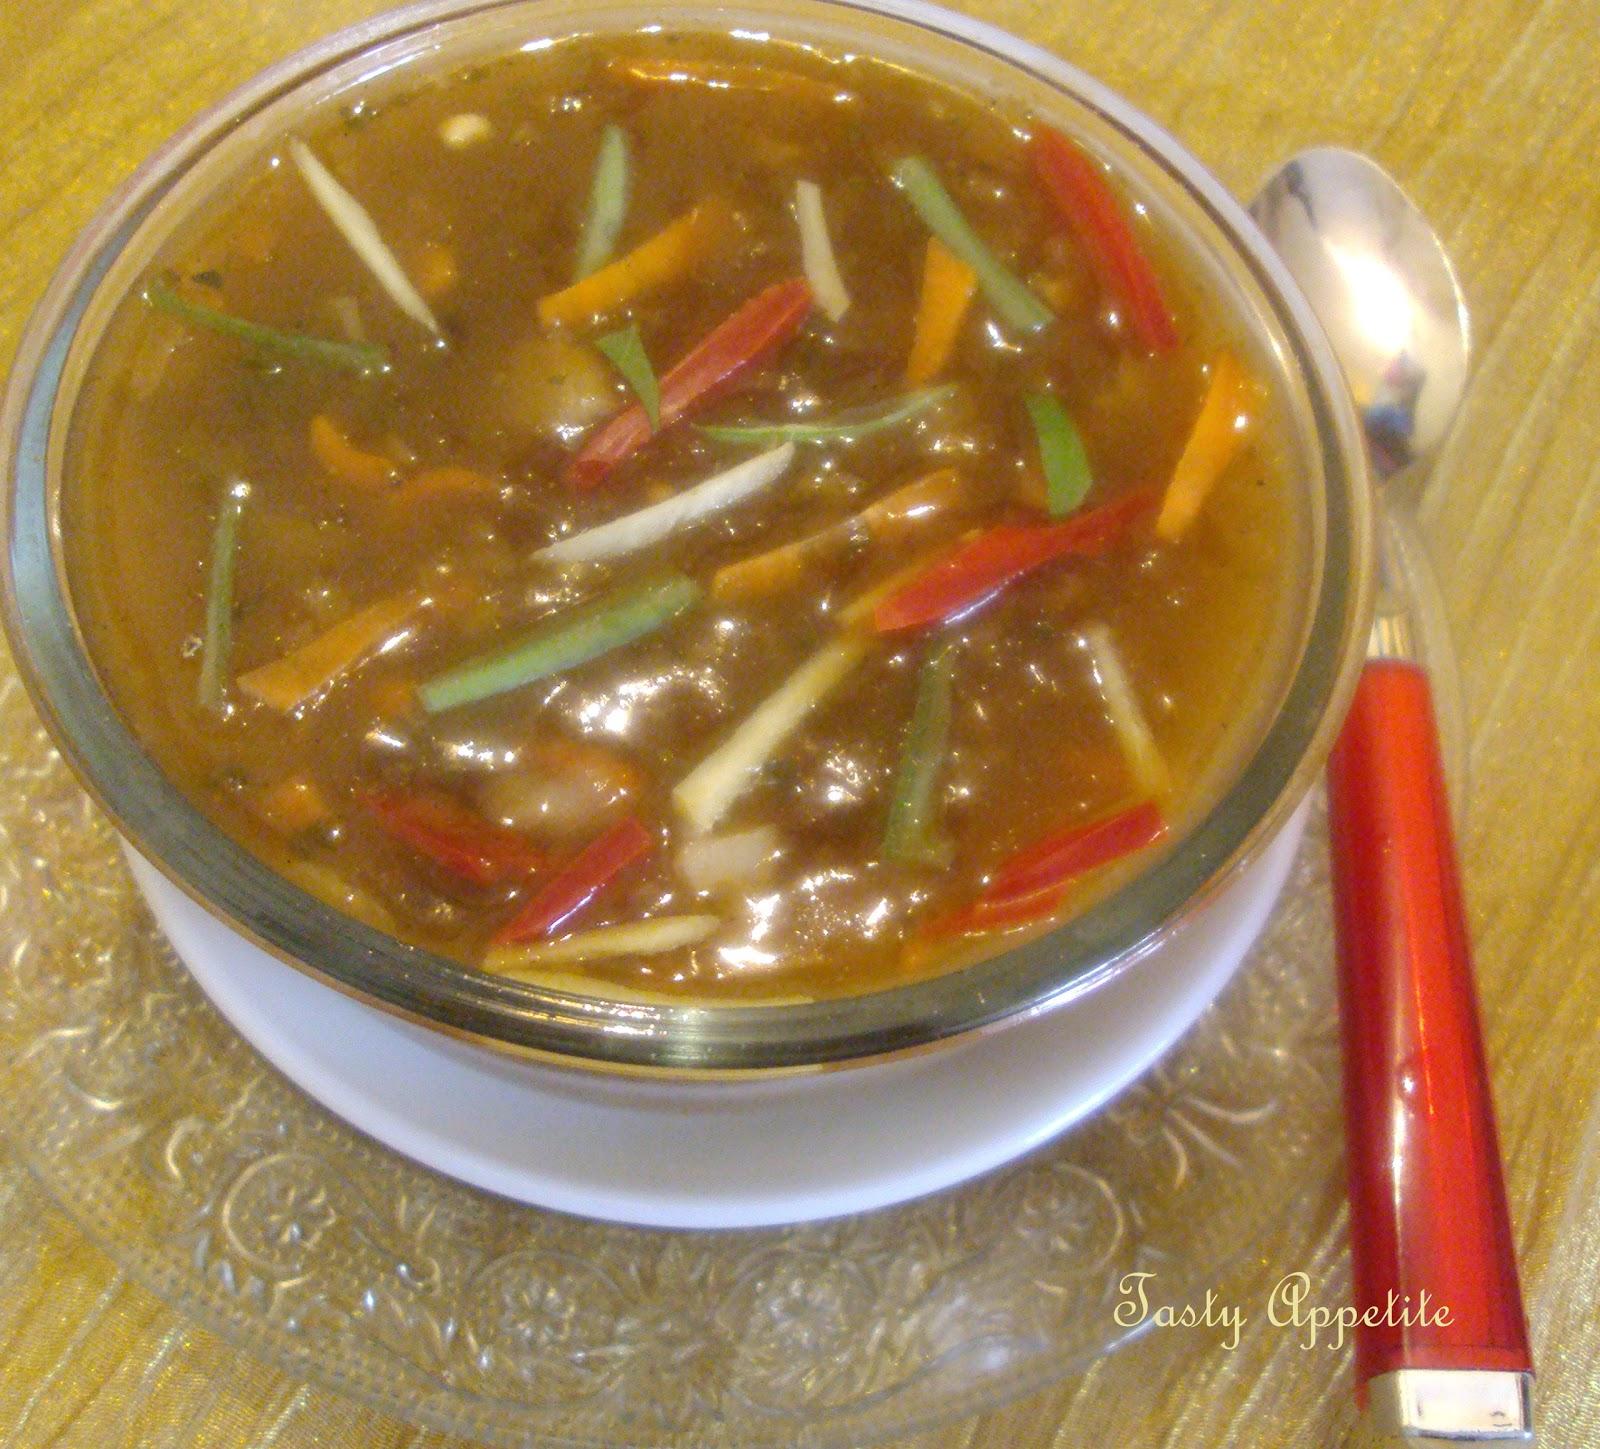 Tasty Appetite: Hot & Sour Tasty Veg Soup